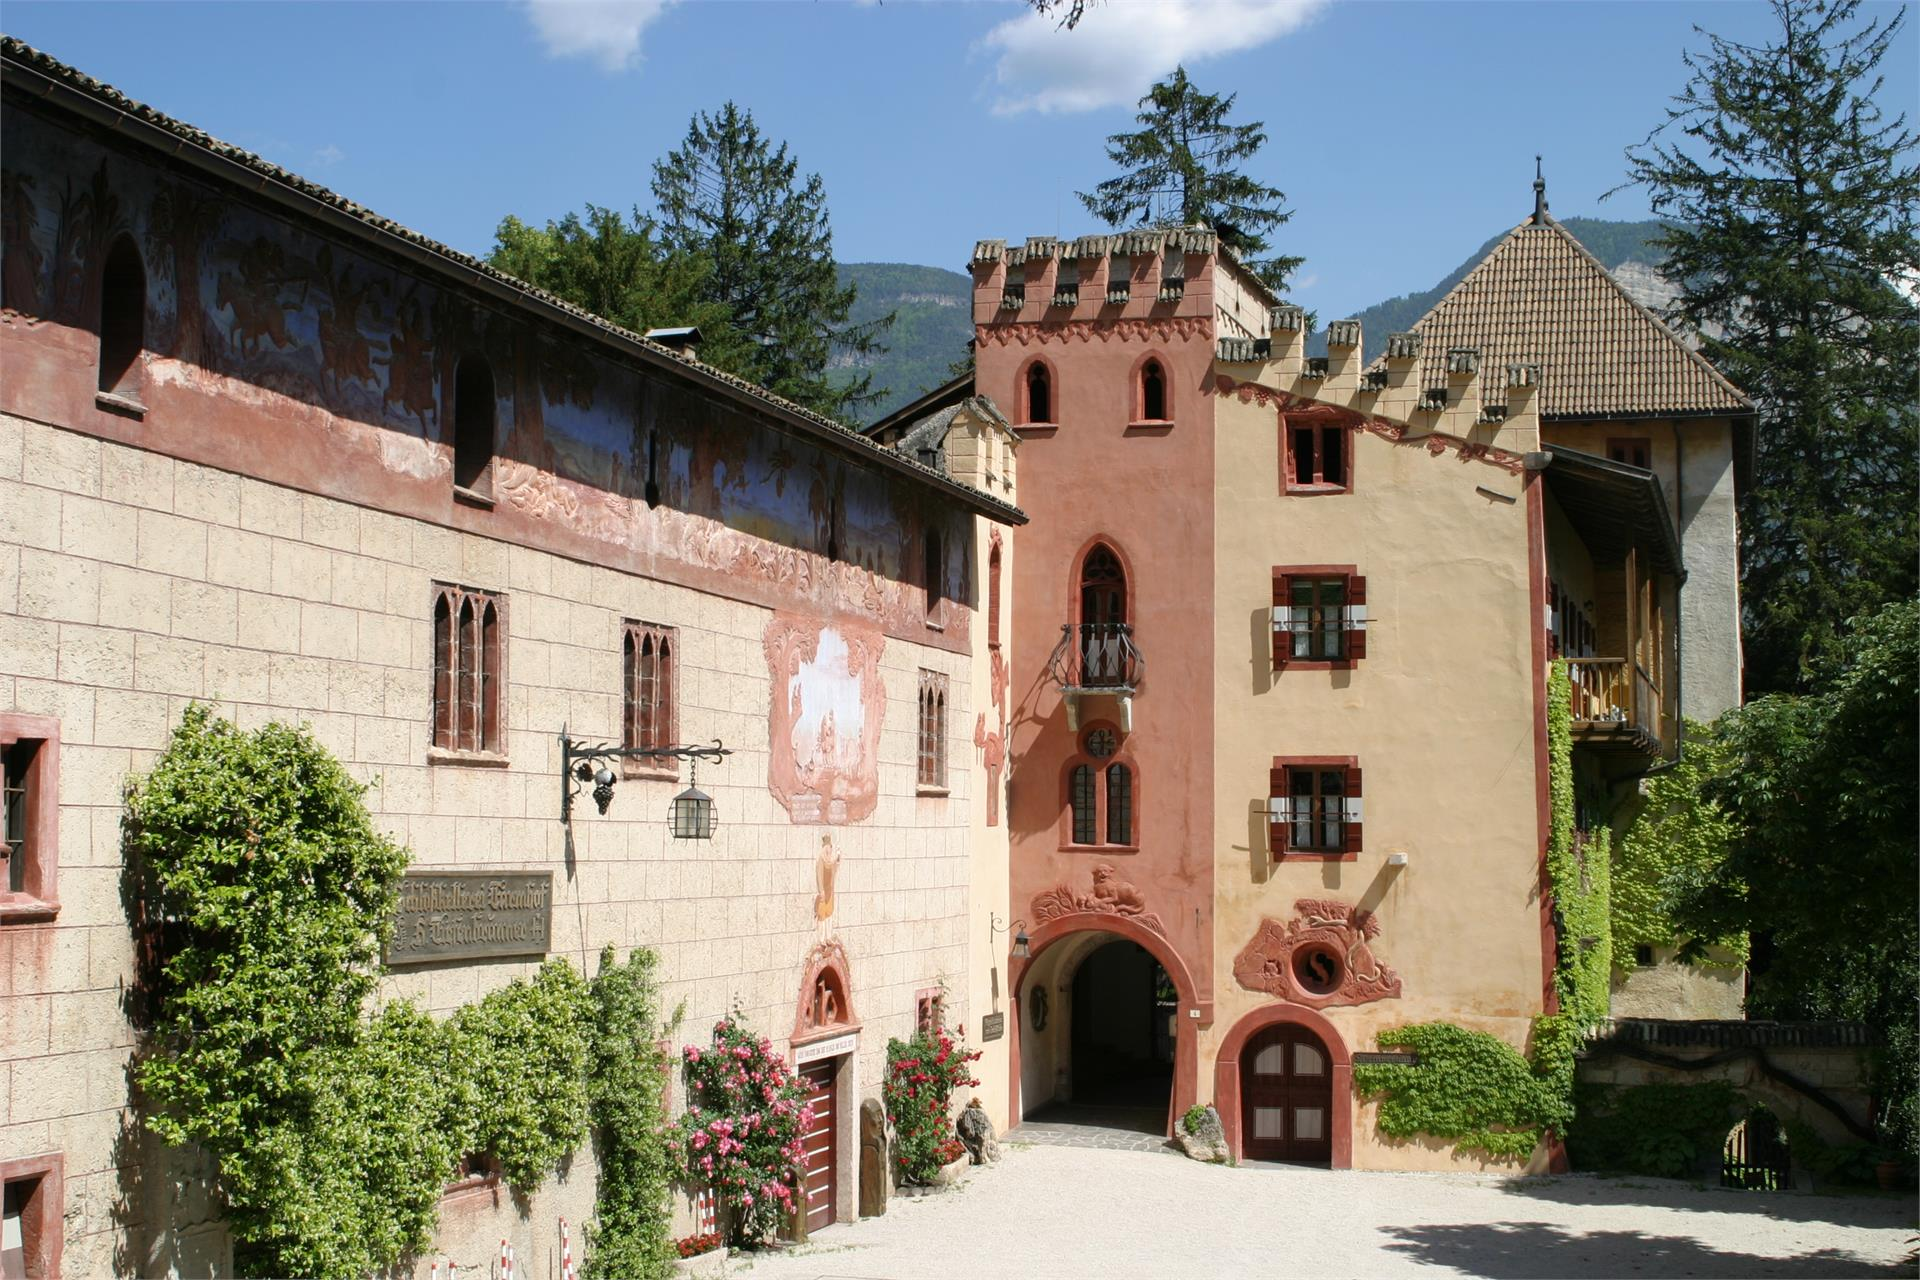 Tiefenbrunner - Schlosskellerei Turmhof